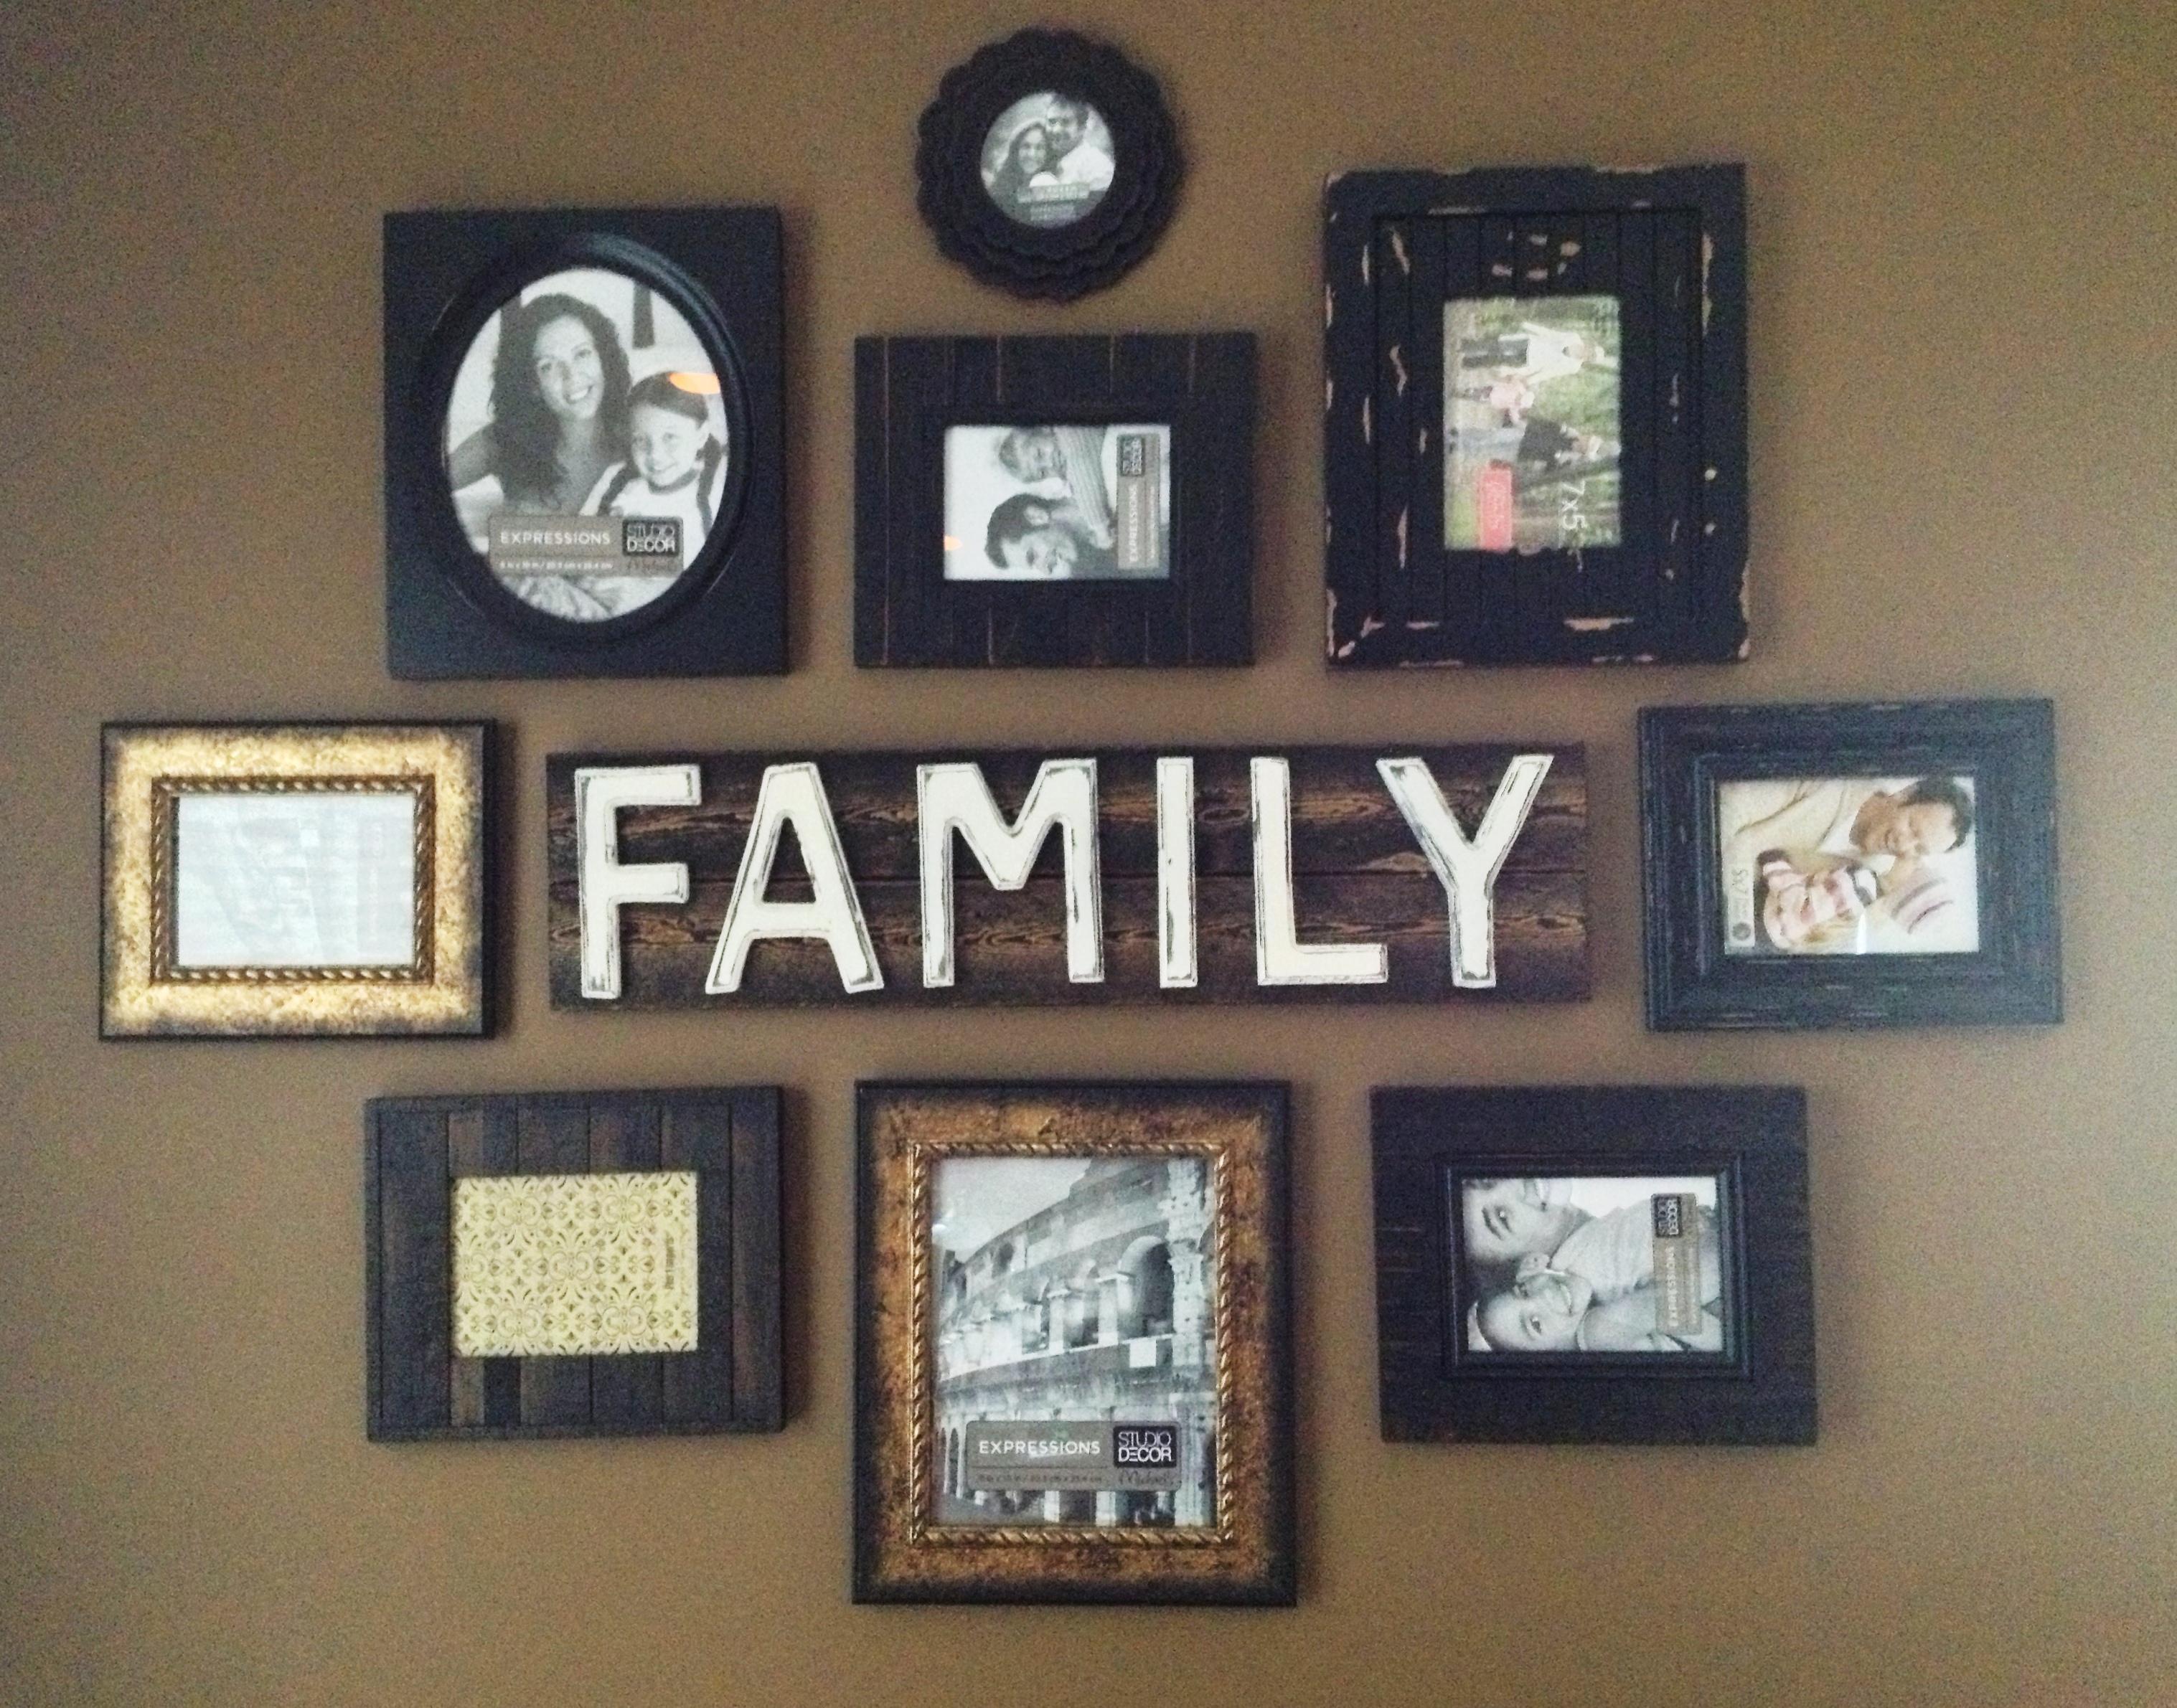 Family Wall Art Picture Frames | Wallartideas Intended For Family Wall Art Picture Frames (View 3 of 20)